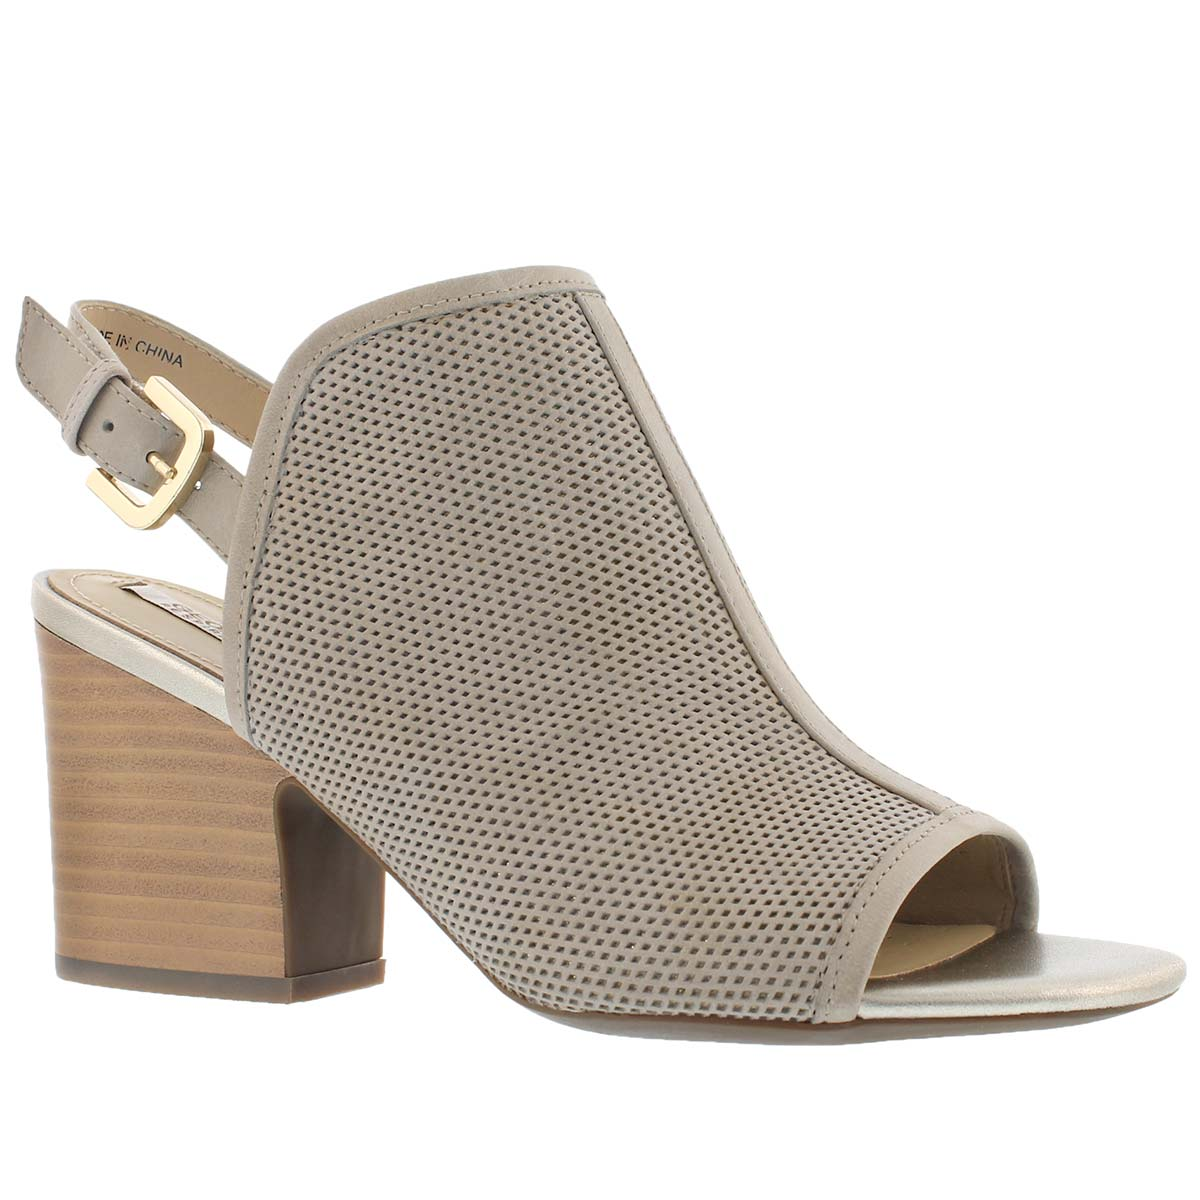 Women's MARILYSE C light taupe/gold dress sandal